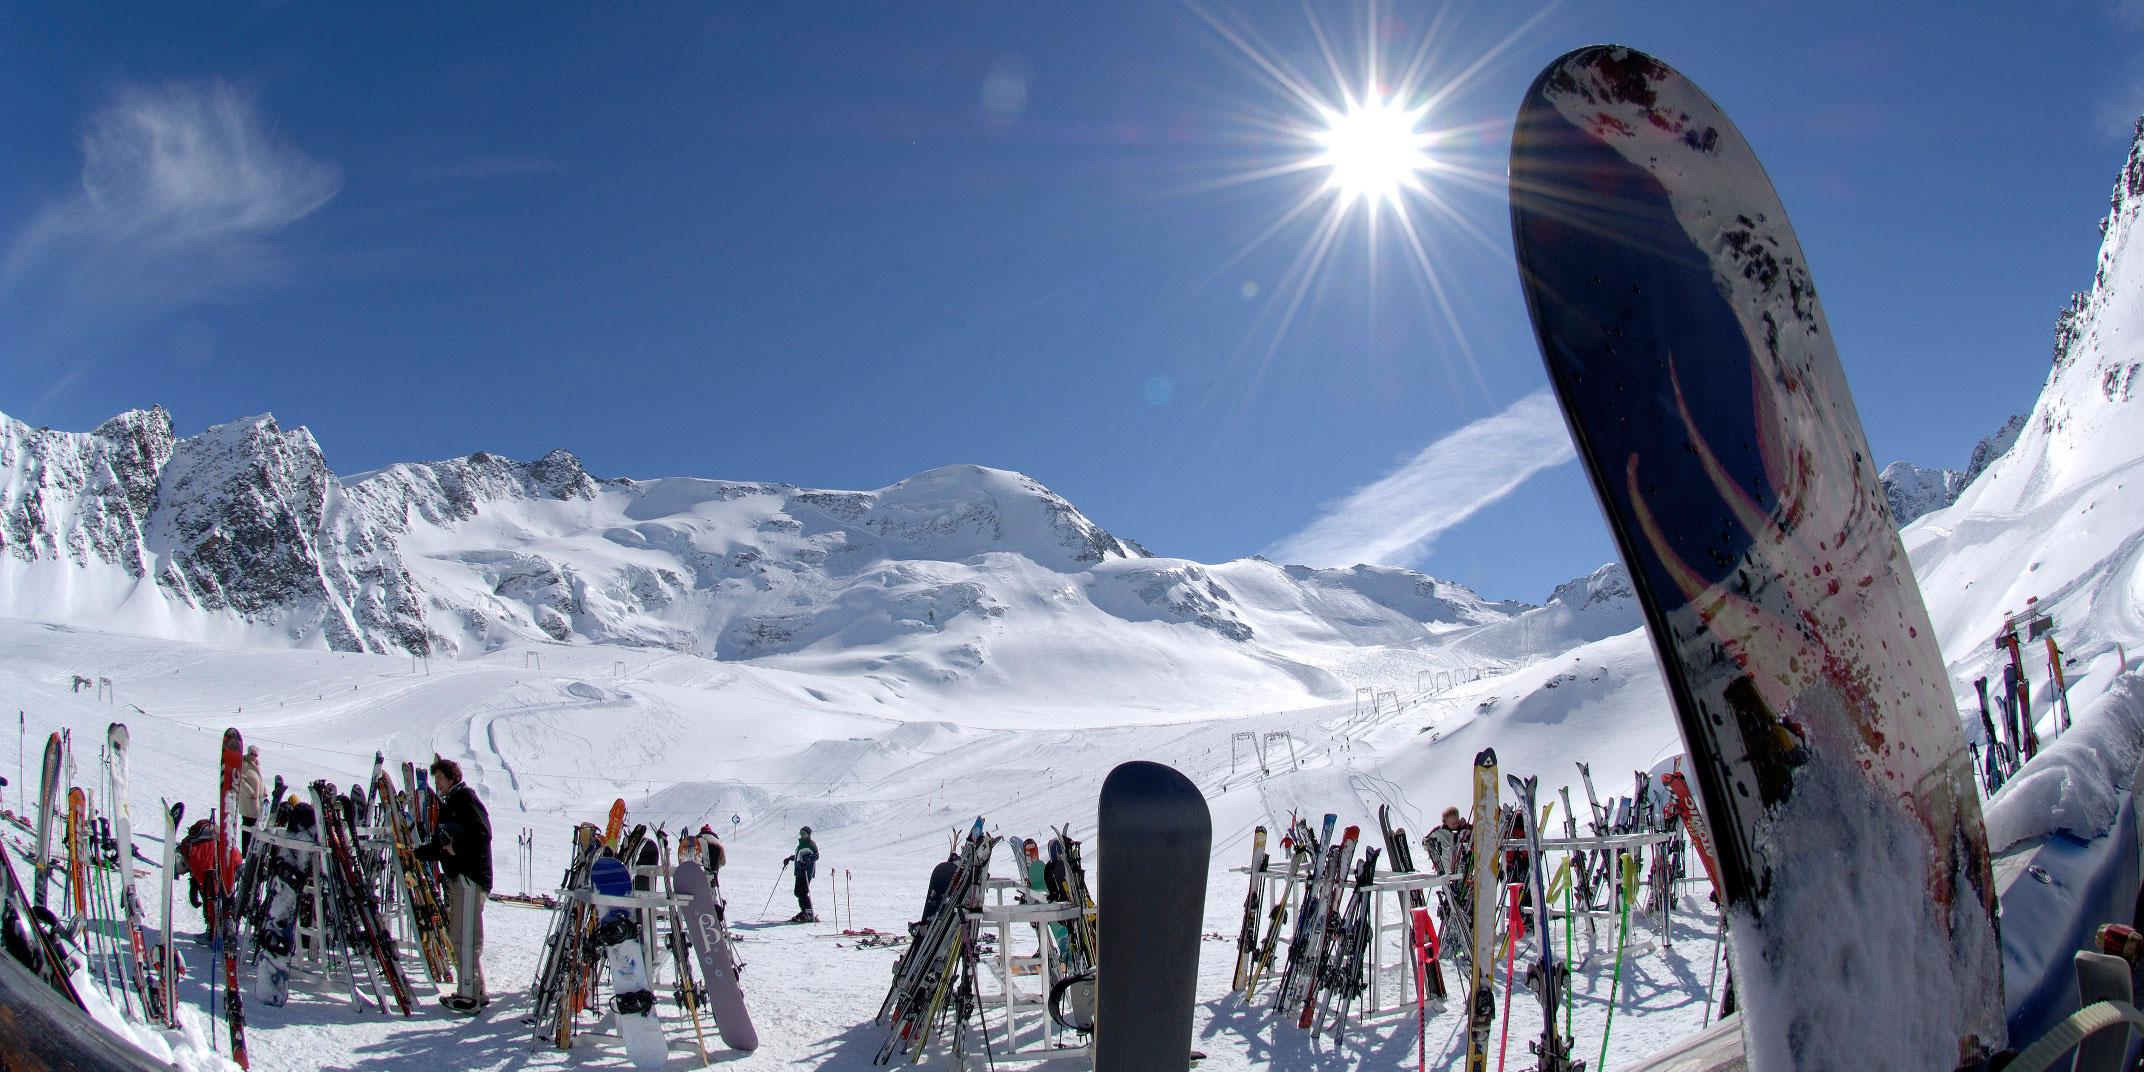 Gletscher Opening Tirol